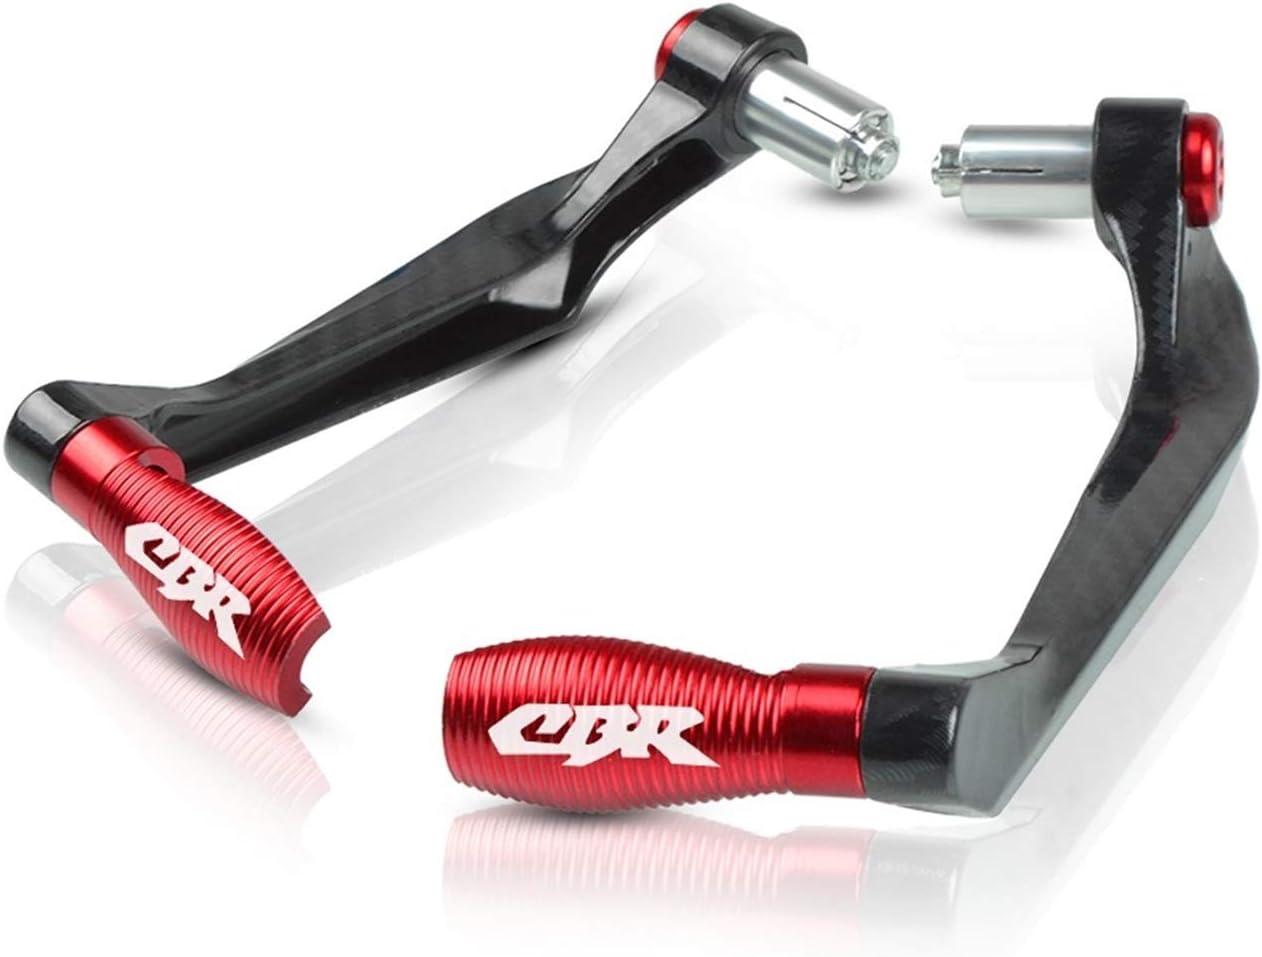 XUEFENG 7//822mm Manubrio per moto Brake Freke Levers Protector Guard per Honda CBR 600 650 900 929 954 Color : Black